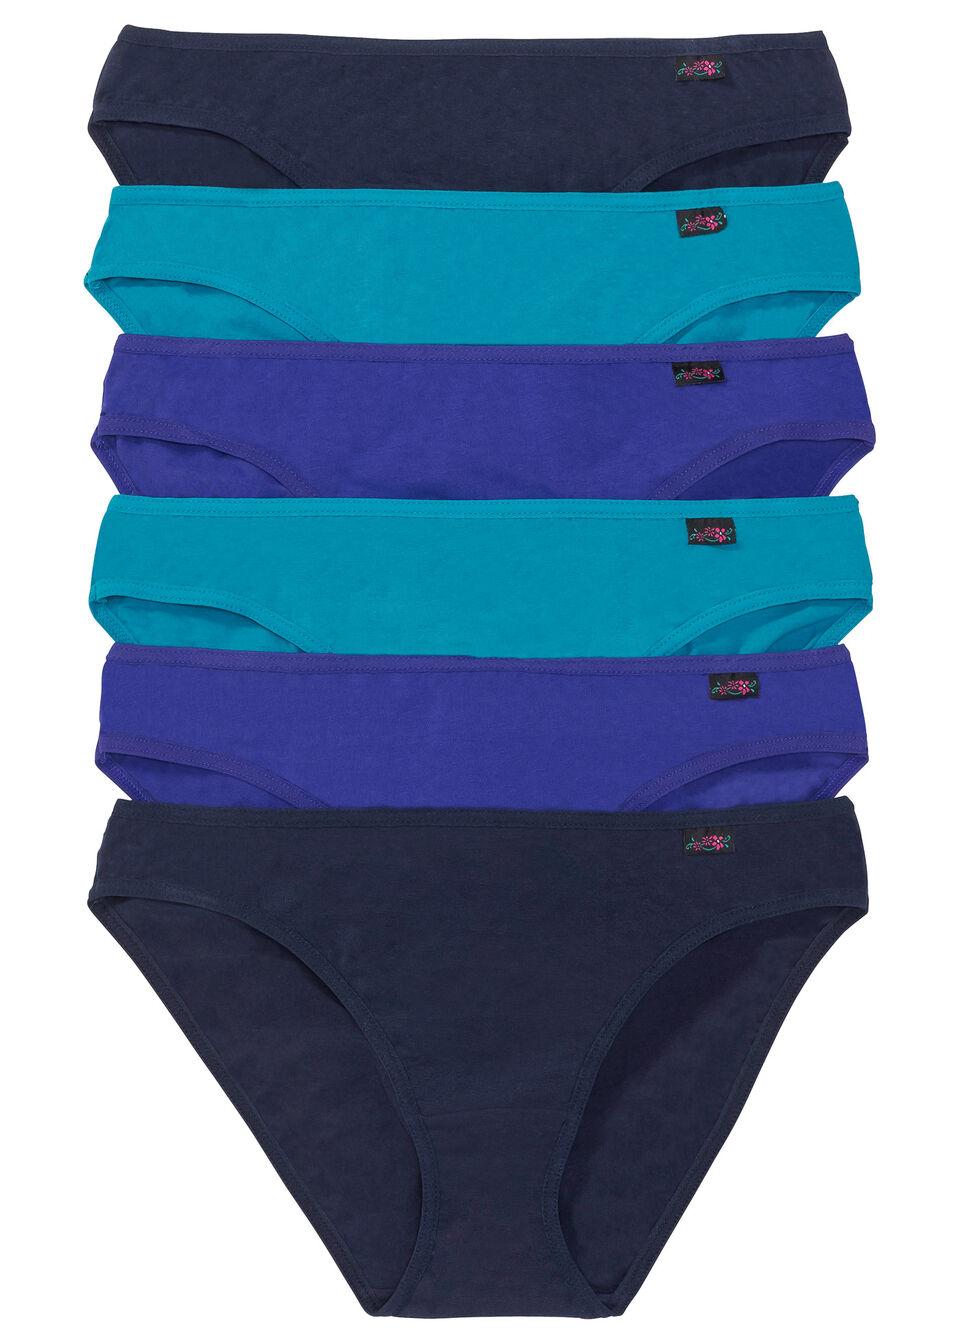 Figi (6 par) bonprix szafirowy+ciemnoturkusowy+ciemnoniebieski